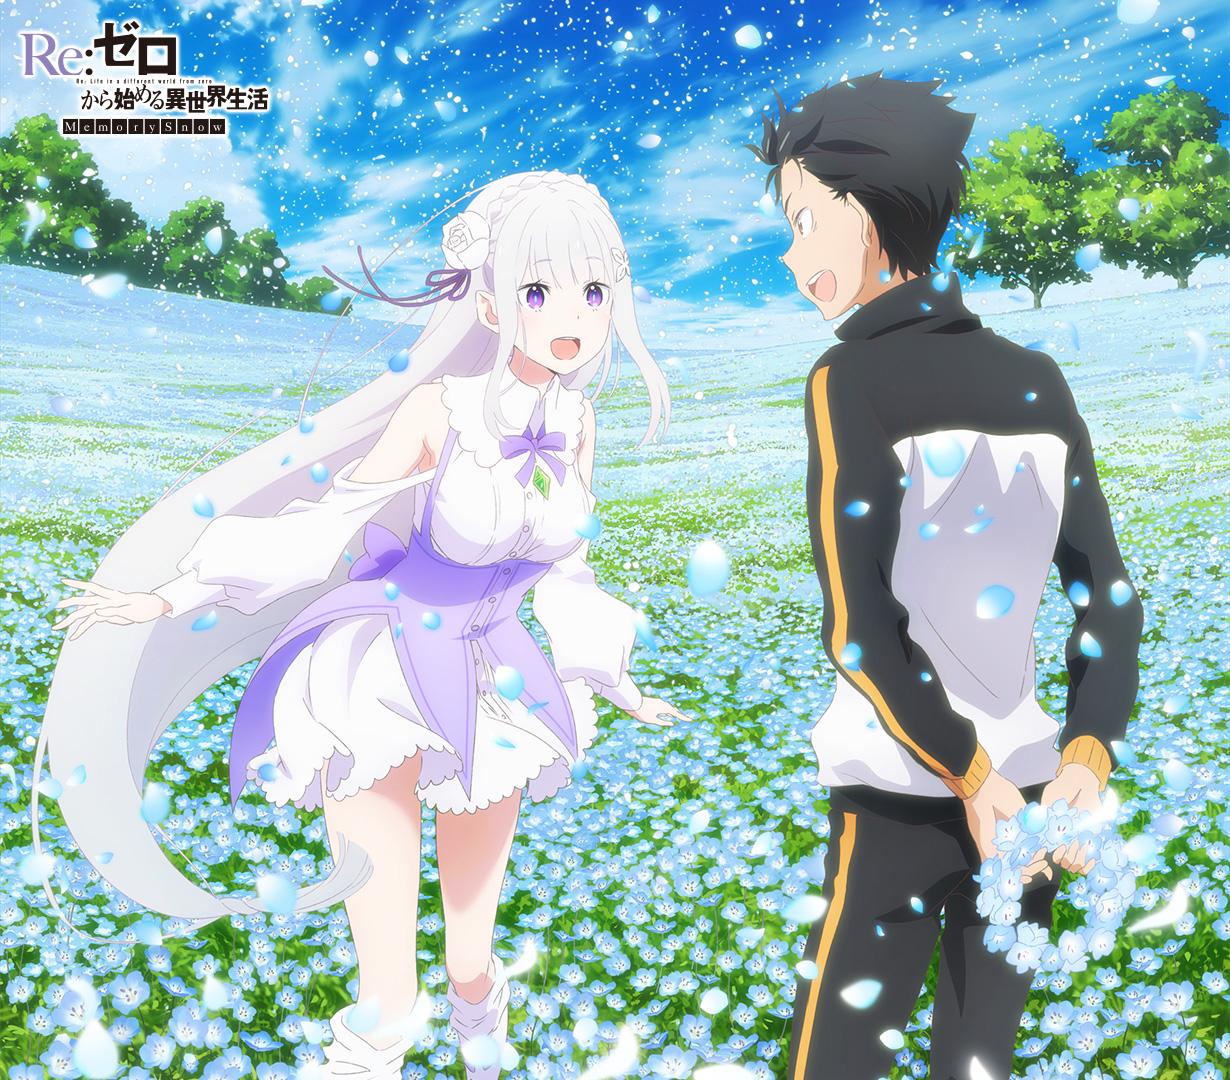 180730 - WHITE FOX原班人馬動畫團隊、OVA《Re:ゼロから始める異世界生活 Memory Snow》將在10/6搶先上映!